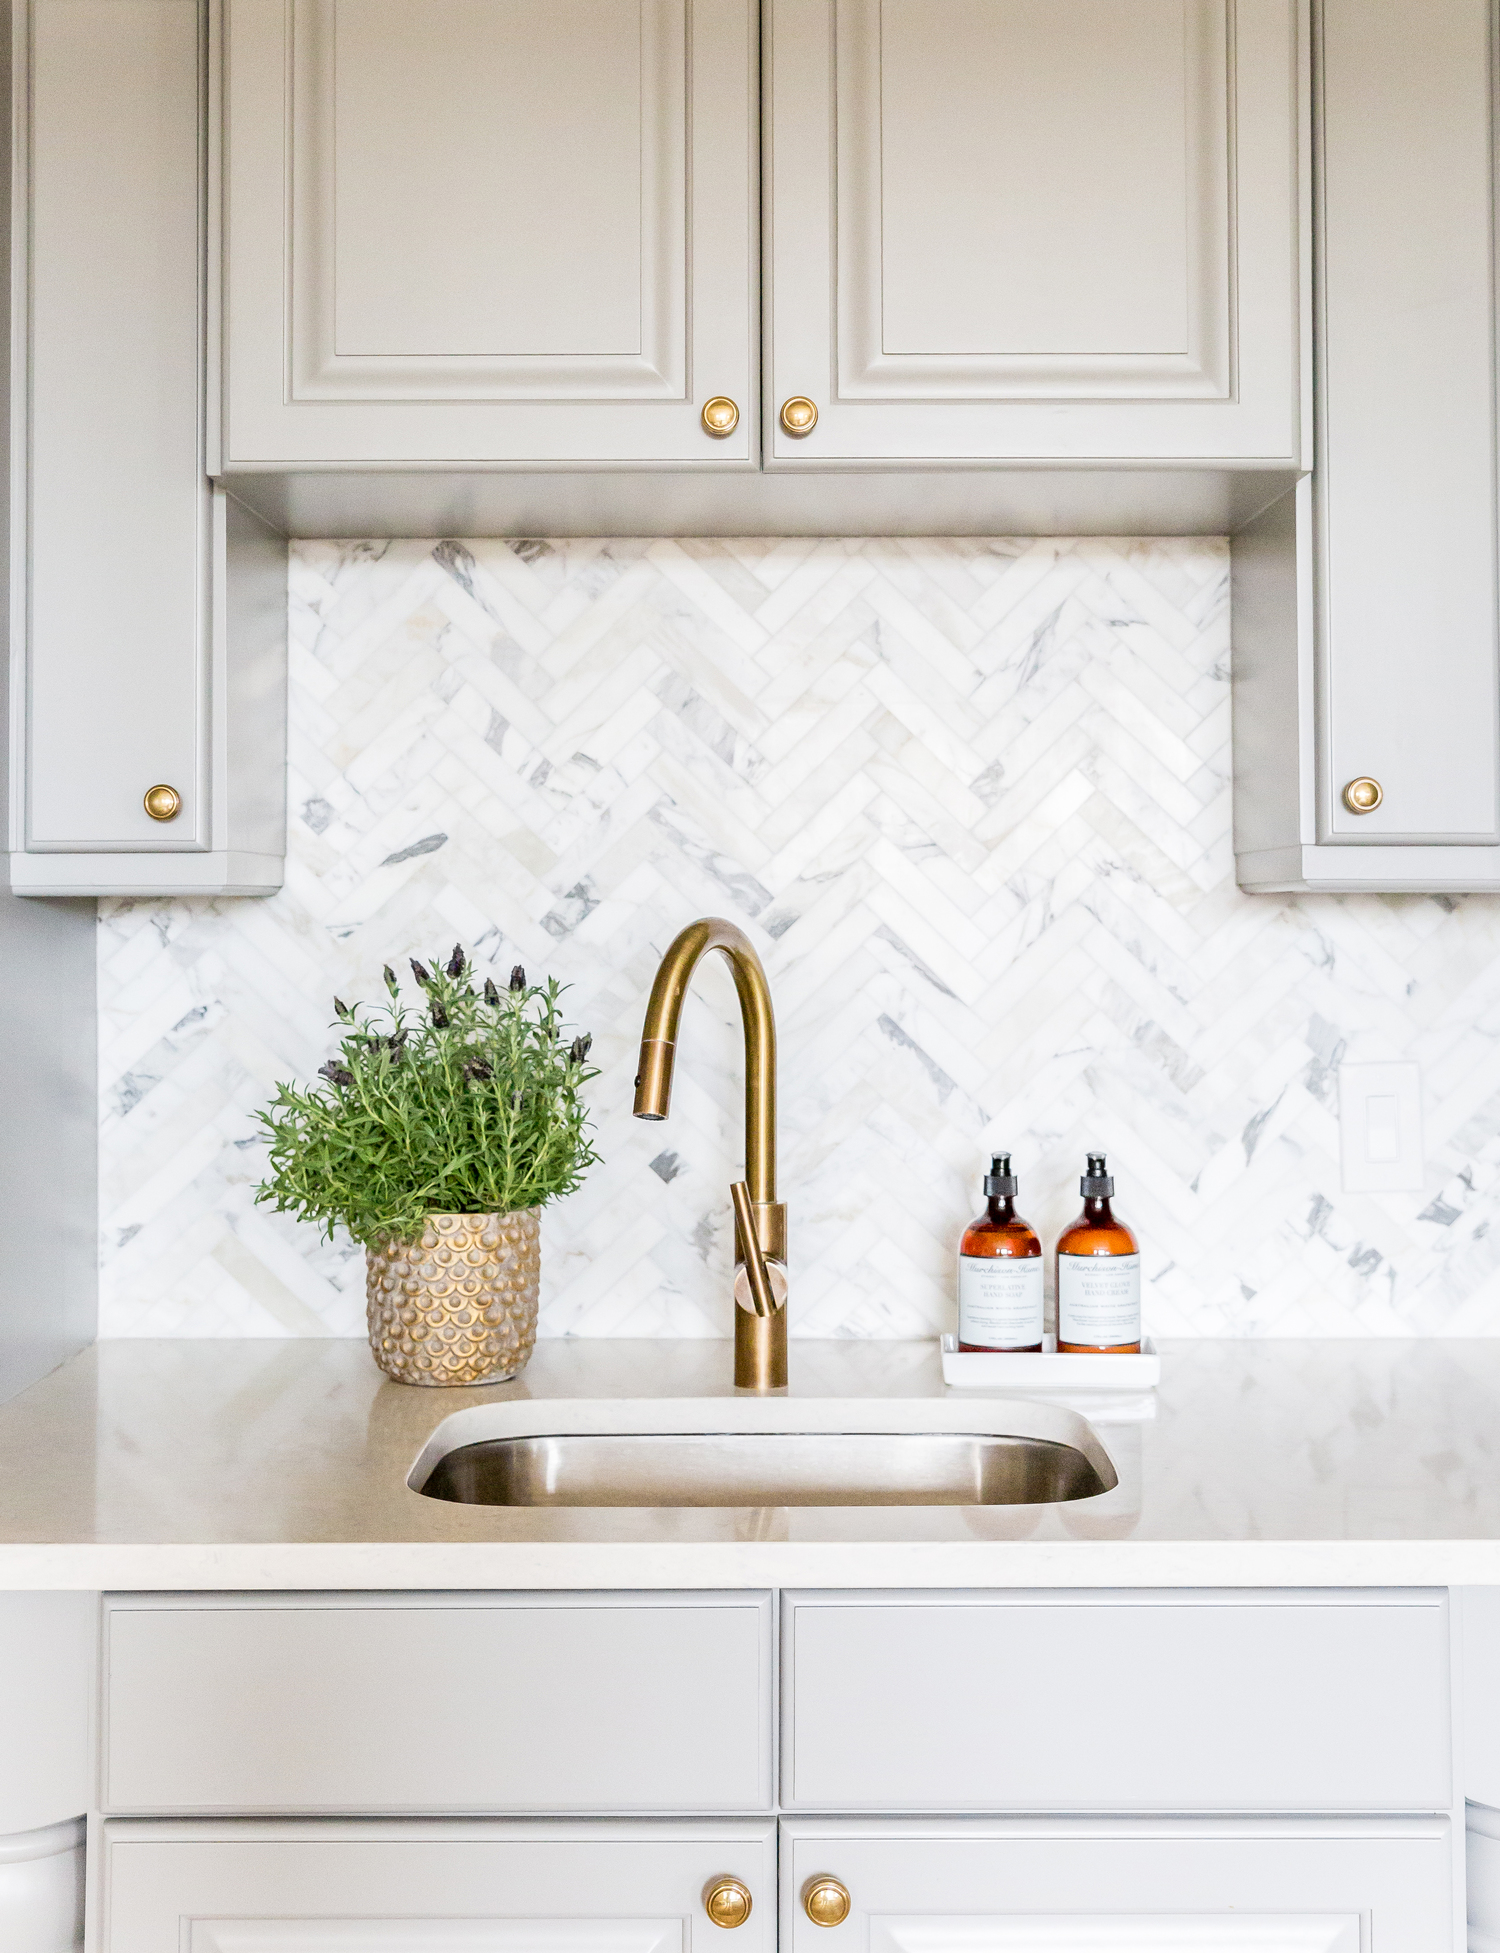 Brass faucet in front of white backsplash